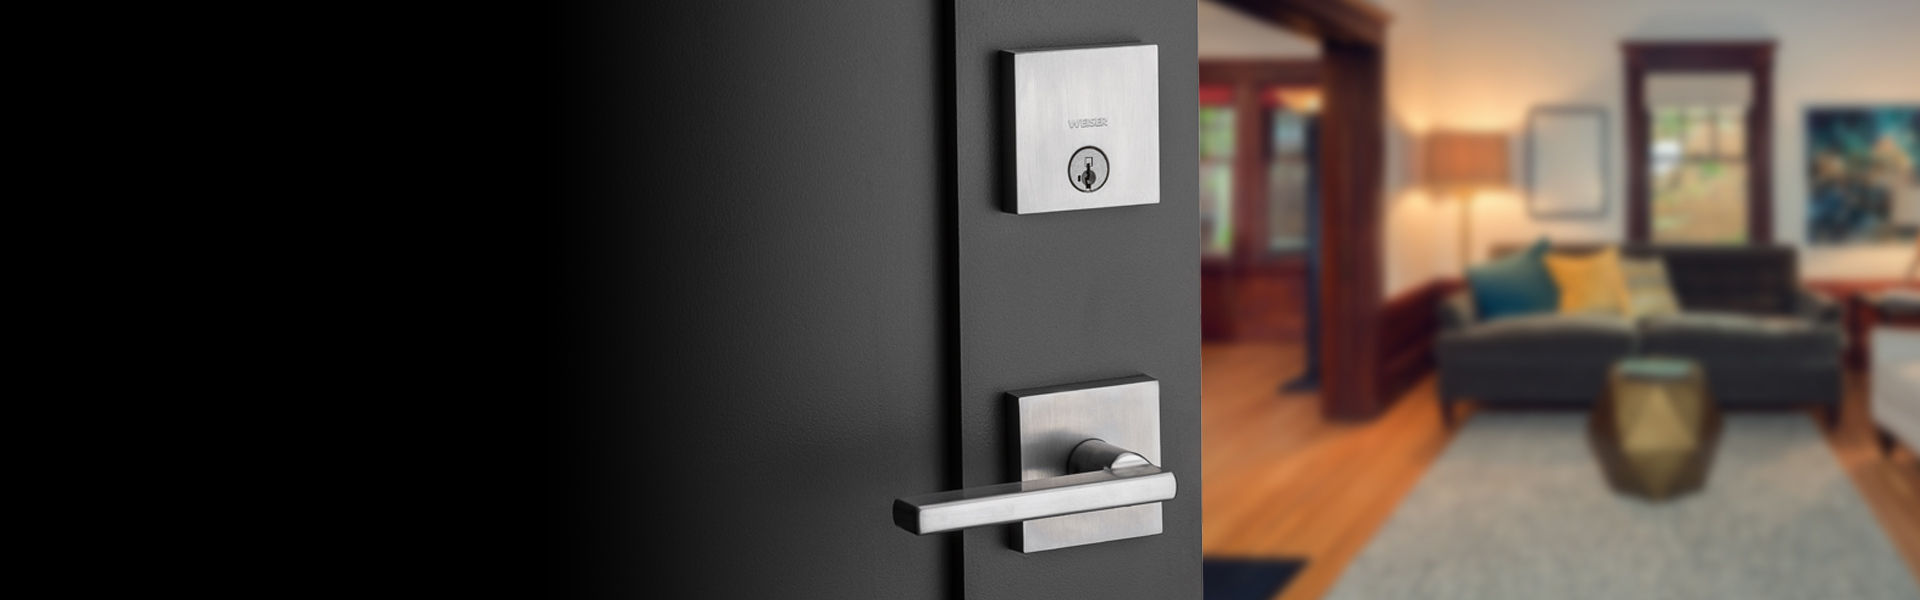 hight resolution of weiser lock deadbolts